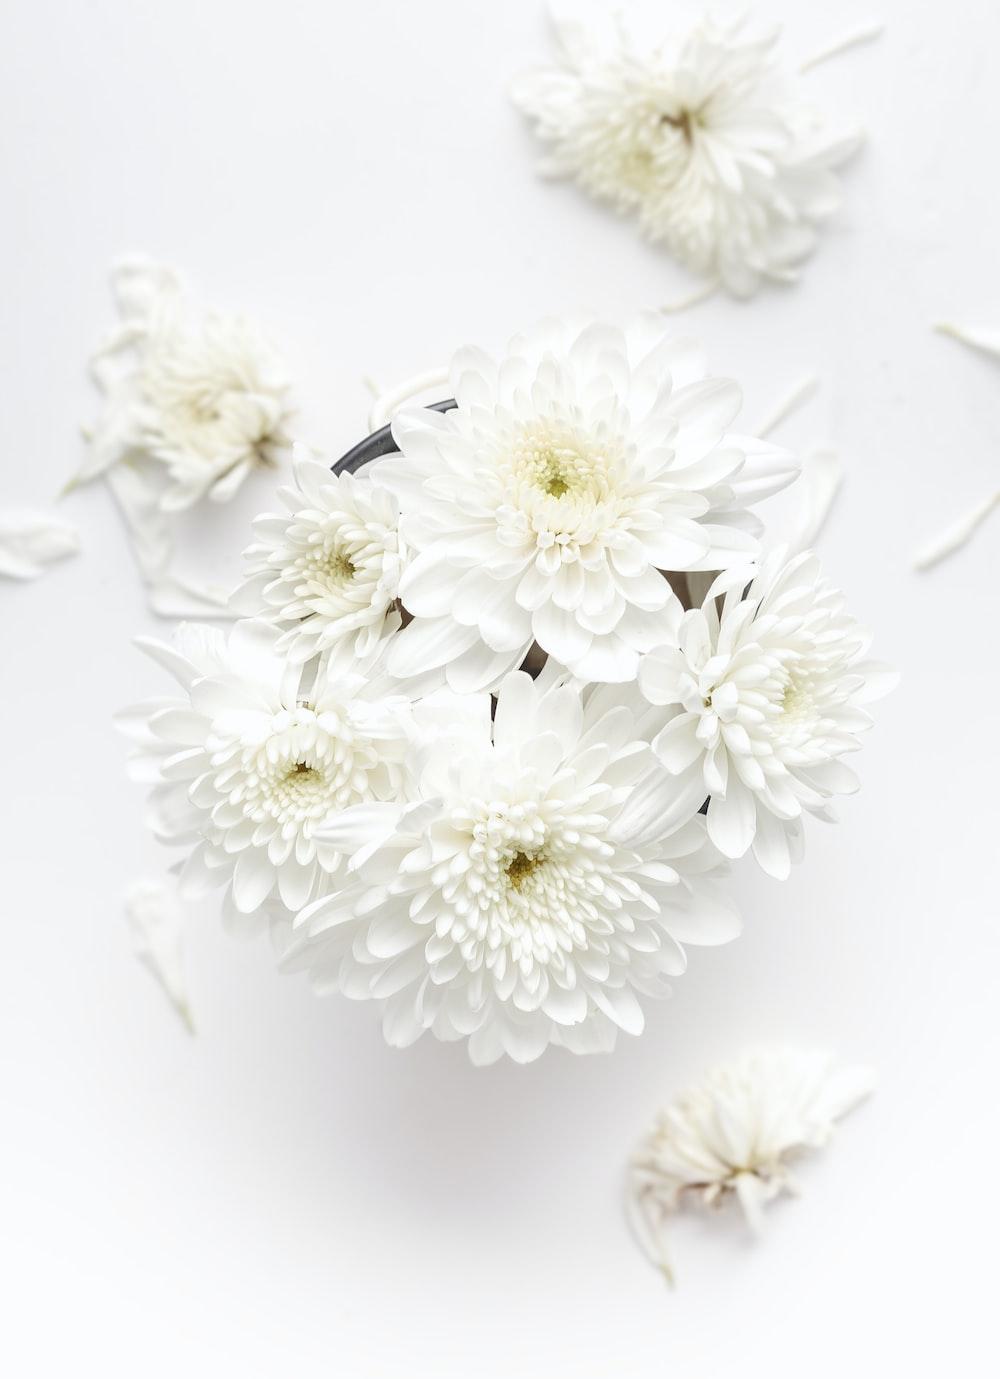 White Peace Photo By Hisu Lee Leehisu On Unsplash